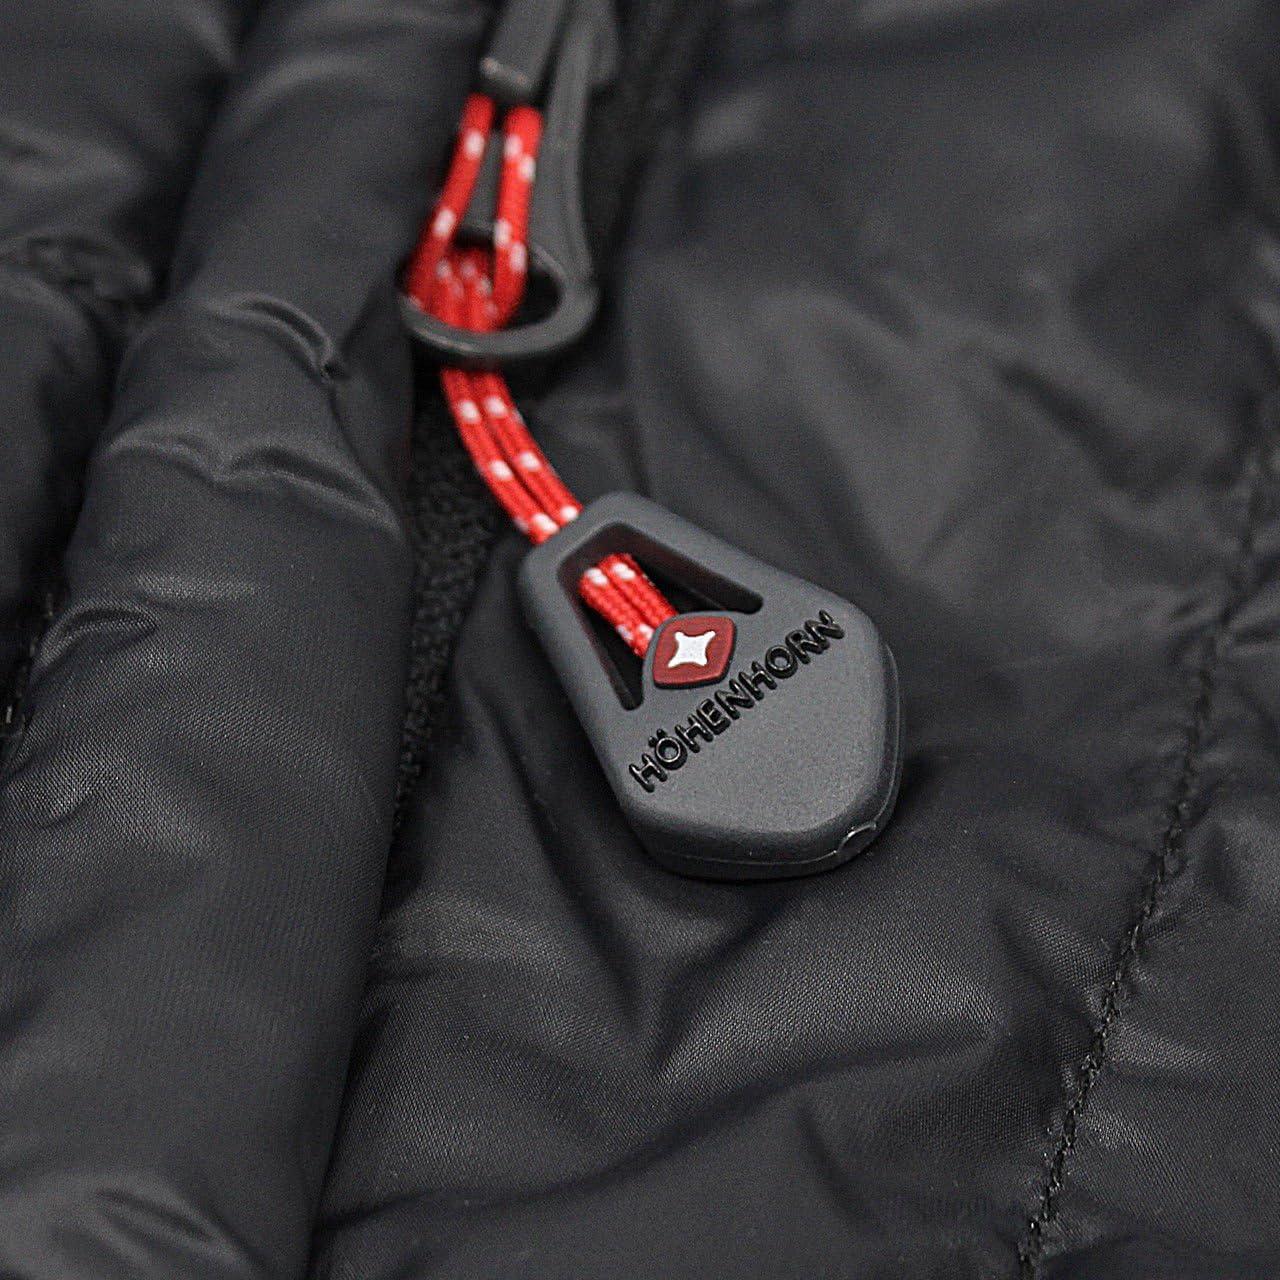 Höhenhorn Liskamm Damen Jacke Übergangsjacke Steppjacke